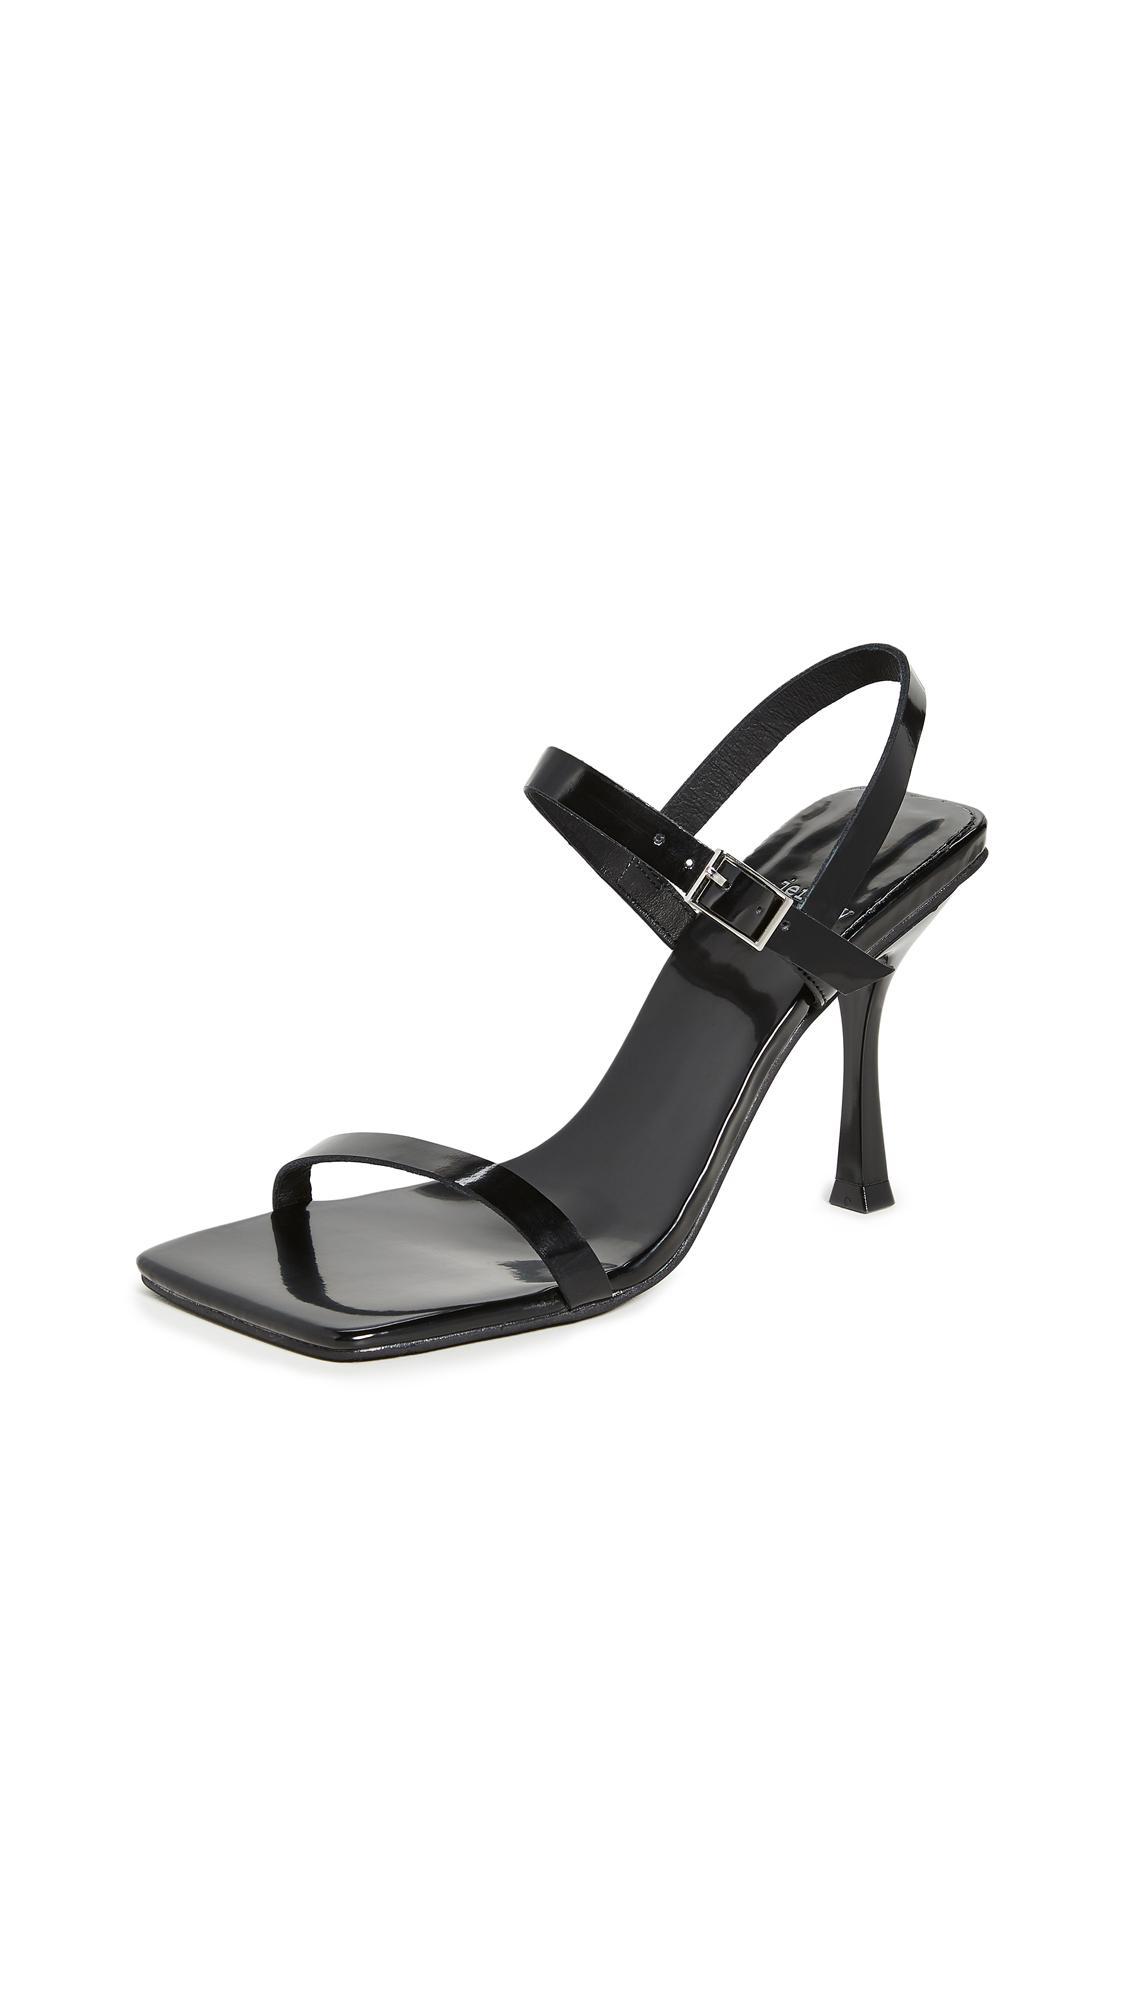 Jeffrey Campbell Mantinee Sandals - 30% Off Sale